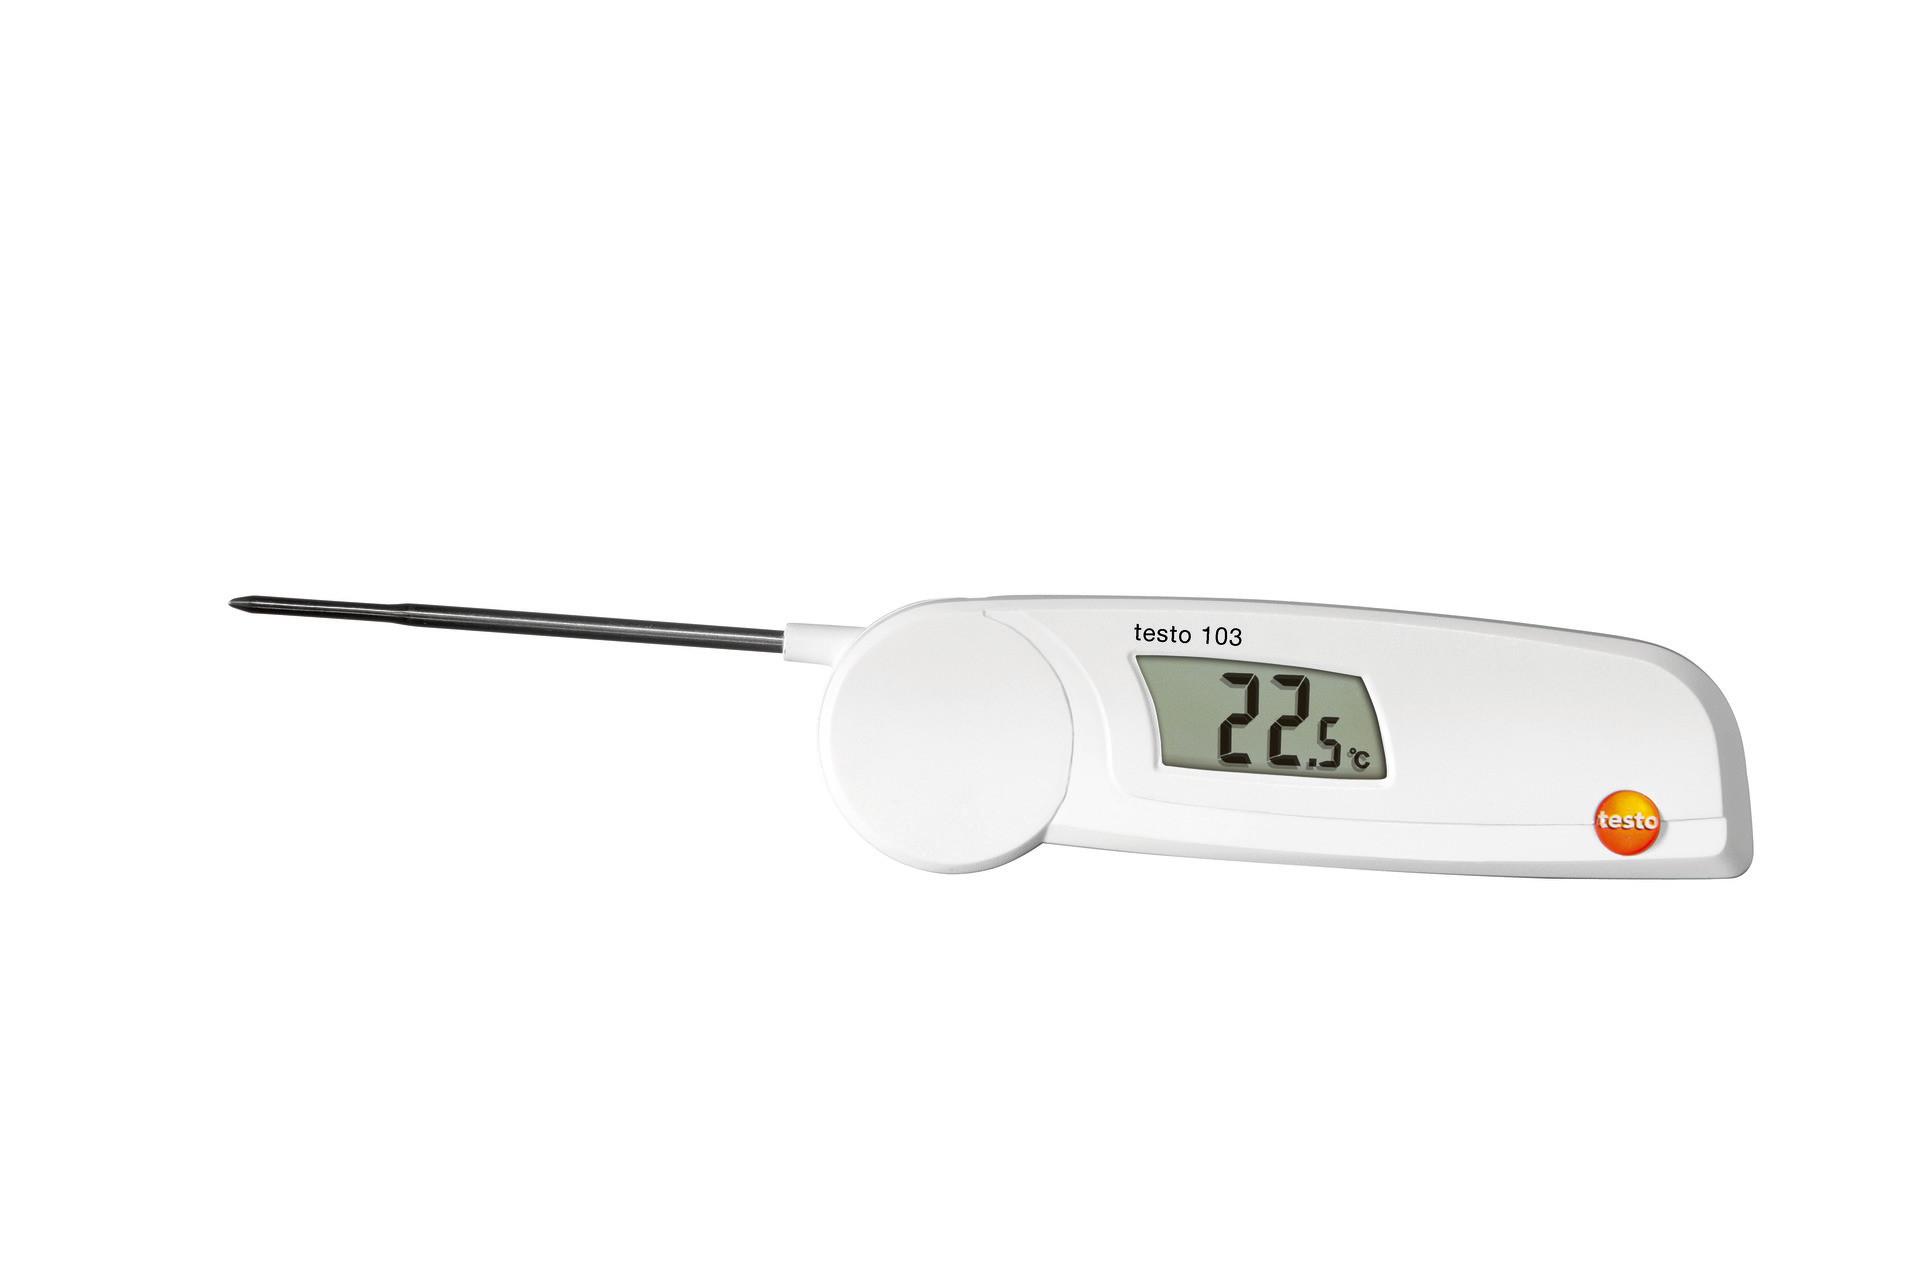 103 Klapp- / Einstech-Thermometer -30°C bis +220°C Fühler 75 mm lang